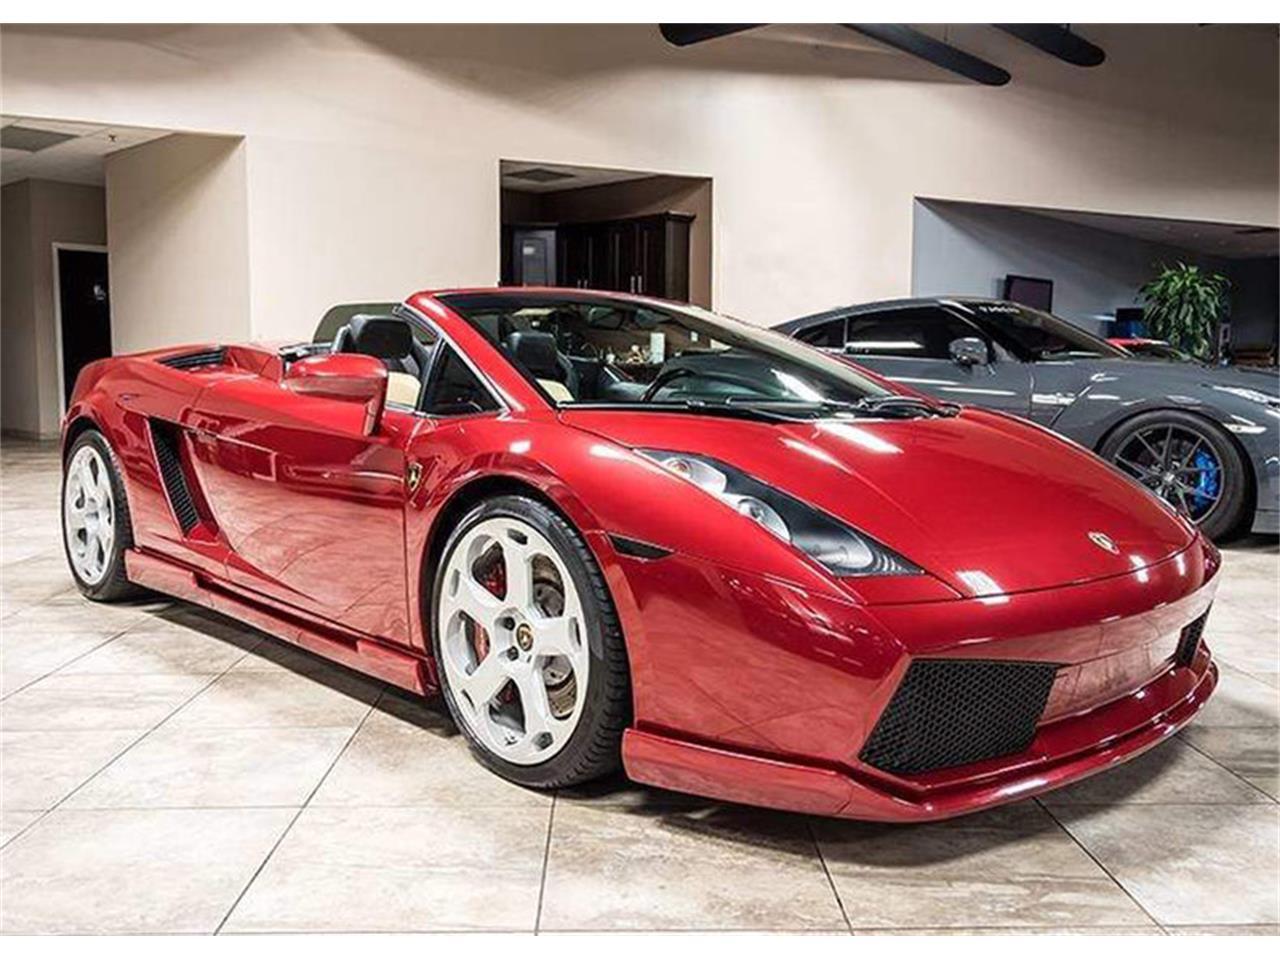 2007 Lamborghini Gallardo For Sale Classiccars Com Cc 990359